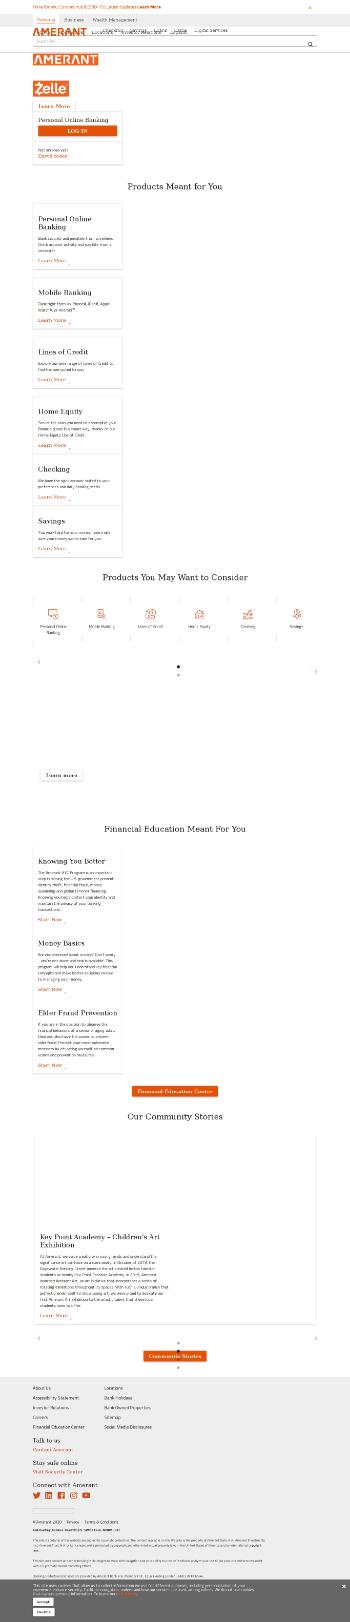 Amerant Bancorp Inc. Website Screenshot